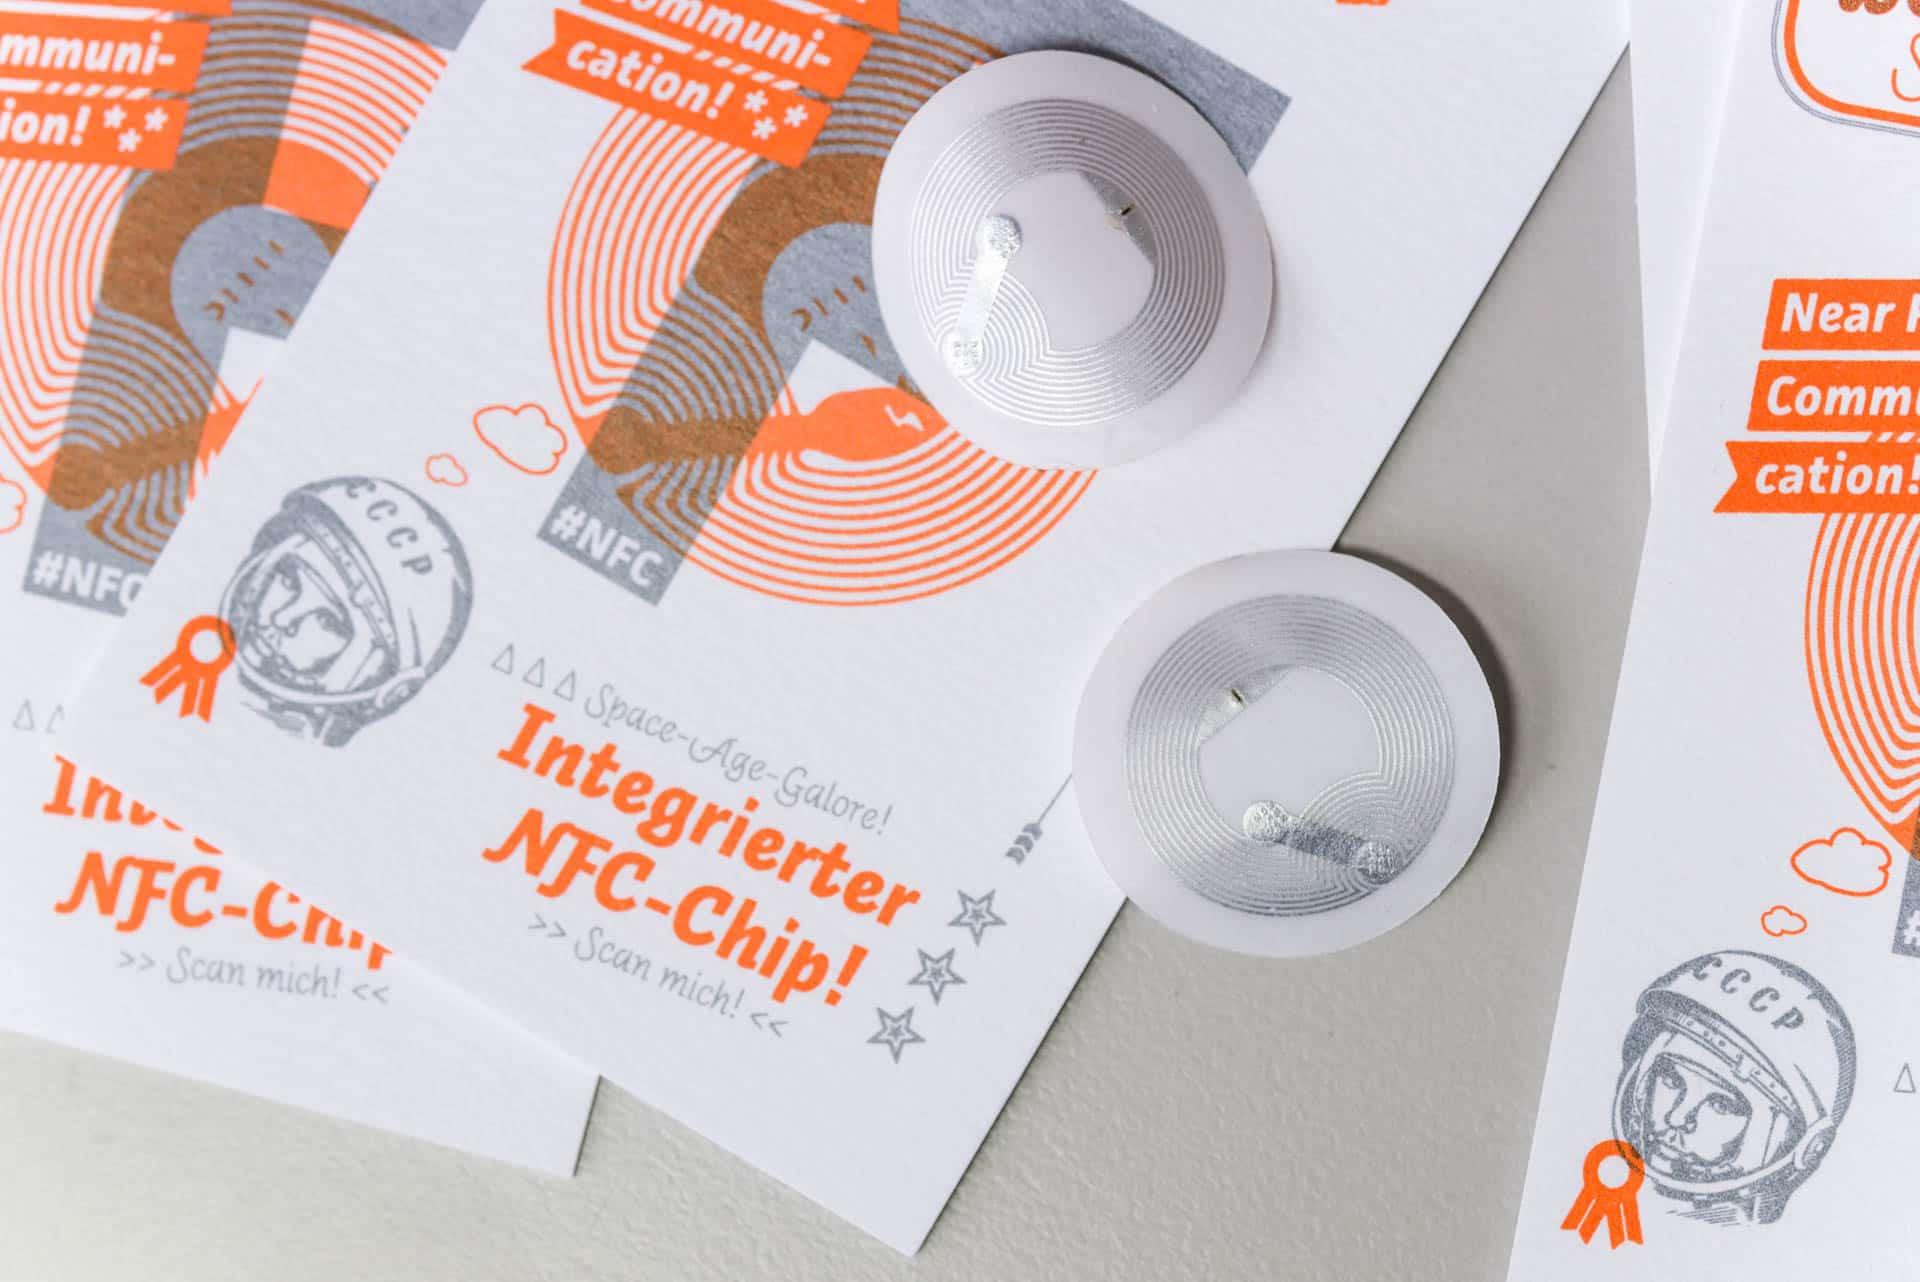 Nfc Visitenkarte Bei Wolf Manufaktur We Love Print